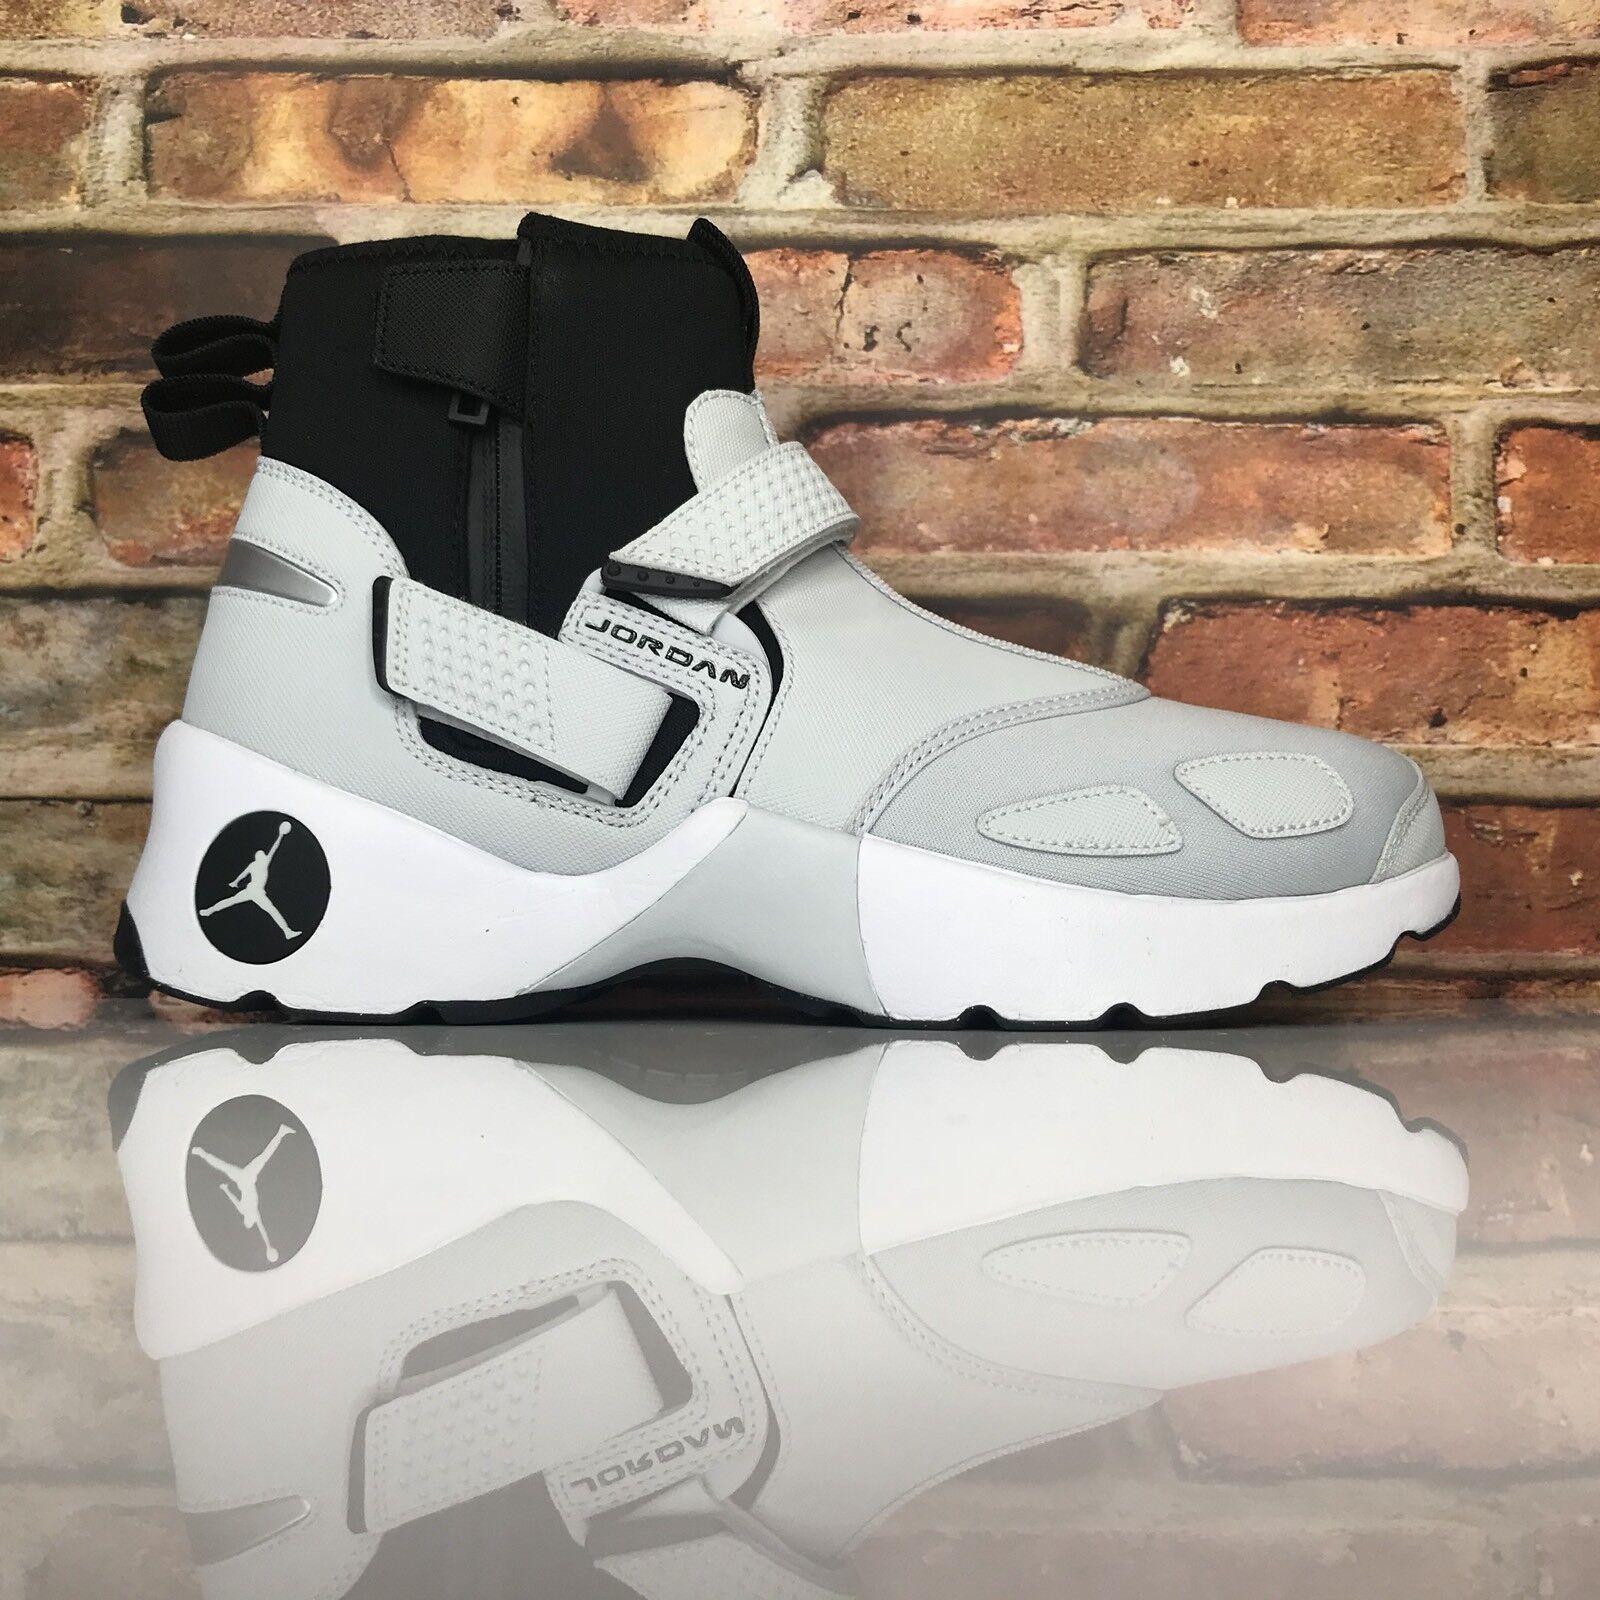 Jordan Trunner LX High Mens Size 10 Pure Platinum White Black  High Top